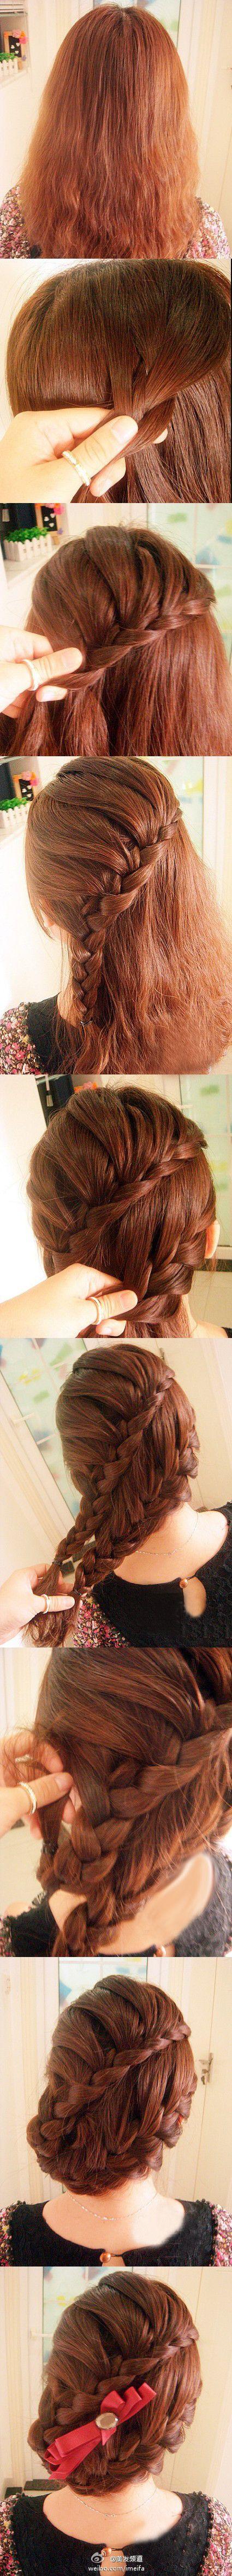 best braids images on pinterest make up looks braids and braid